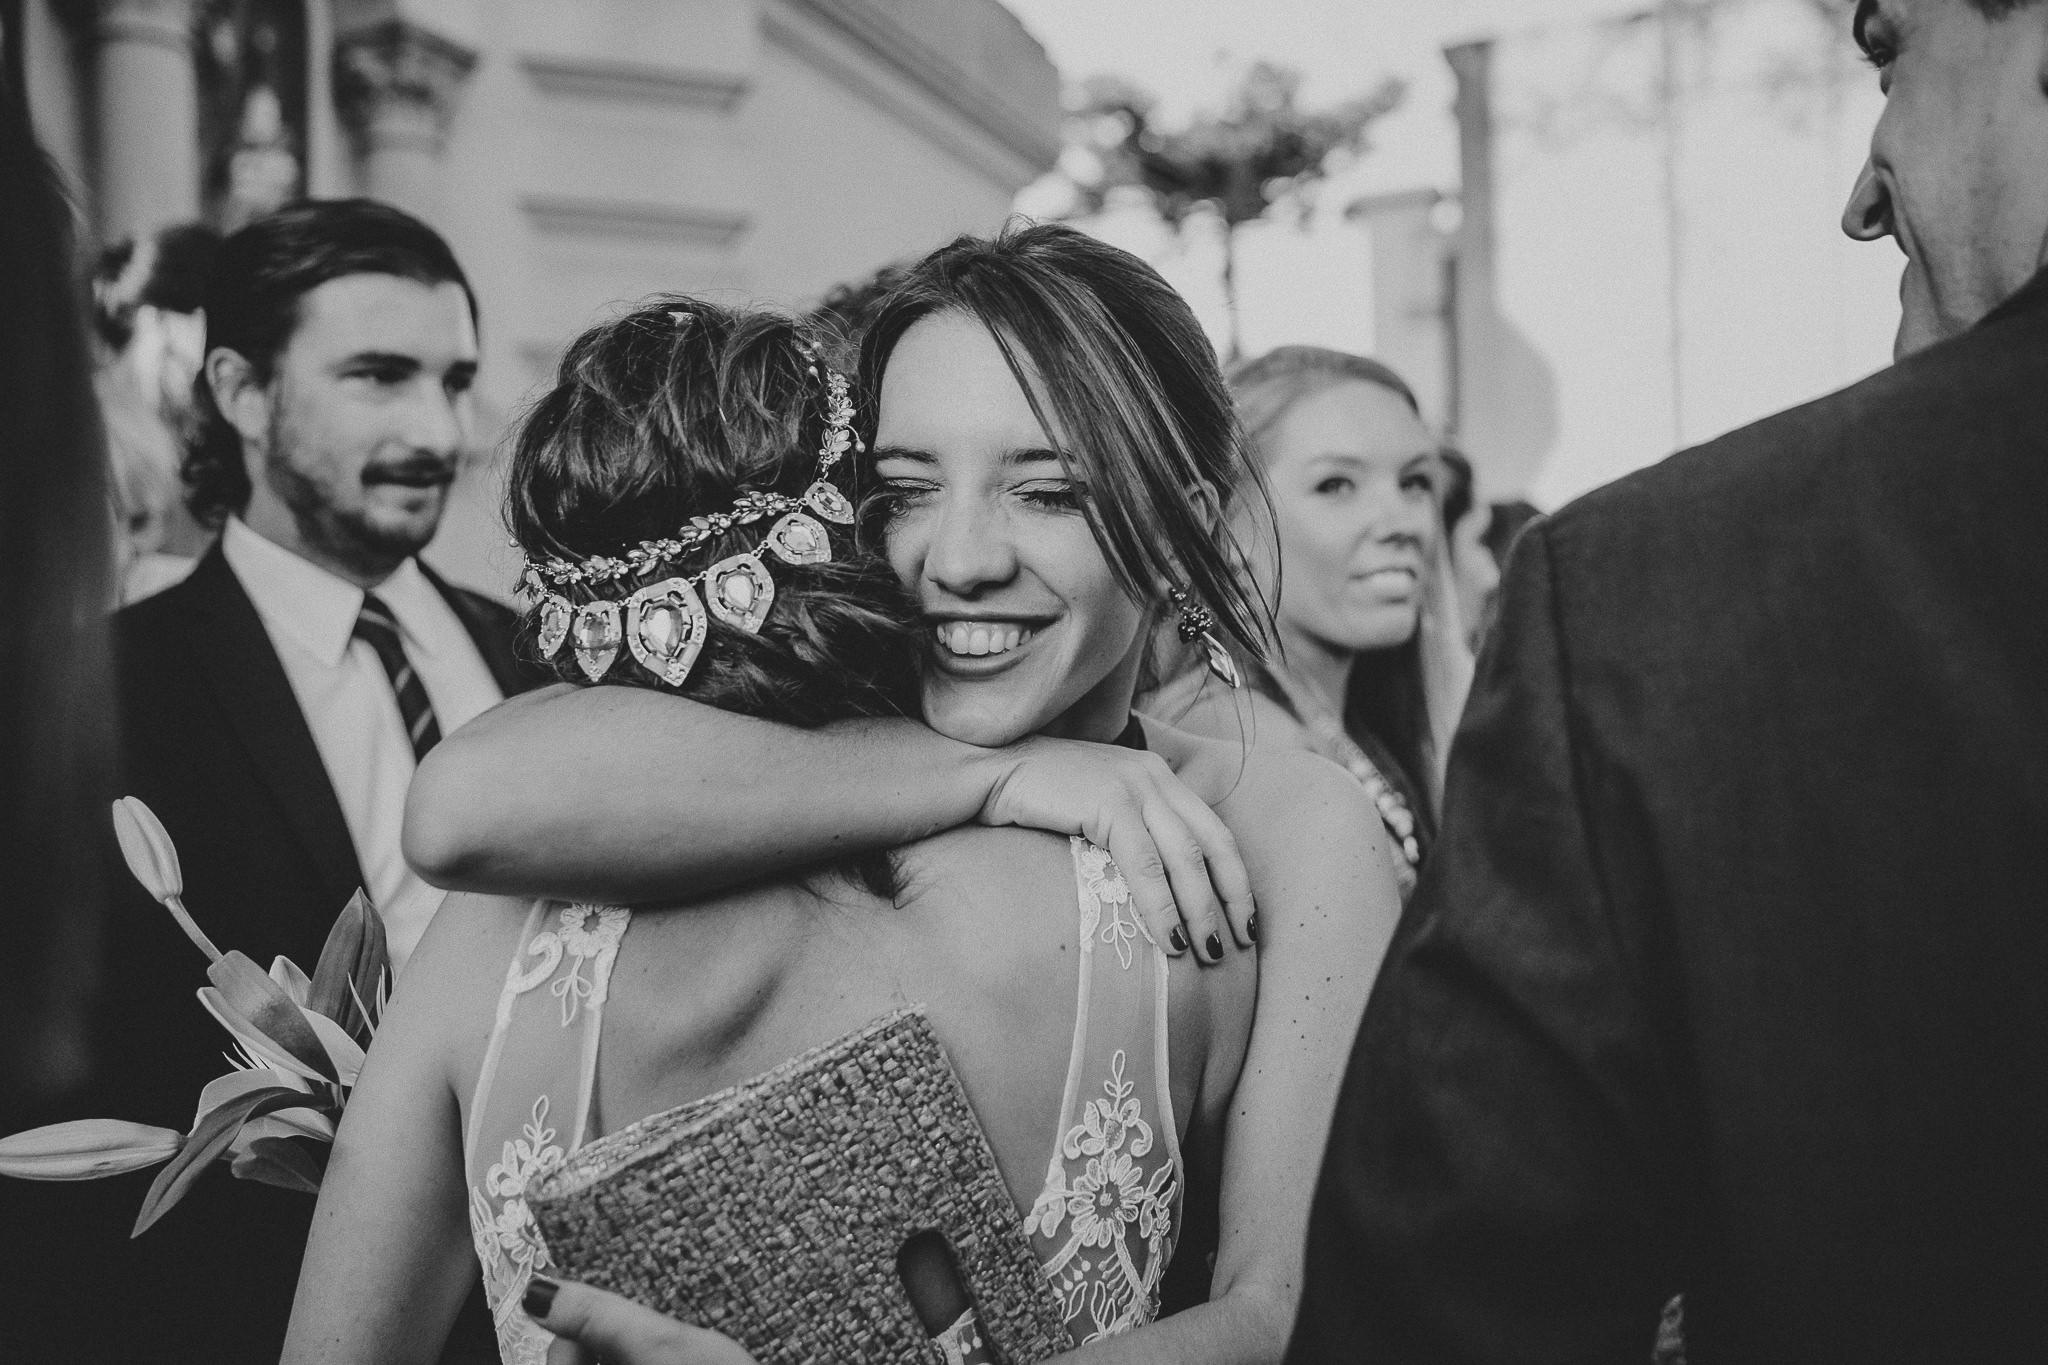 fotografía espontánea de bodas - fotos de boda uruguay - P&I79